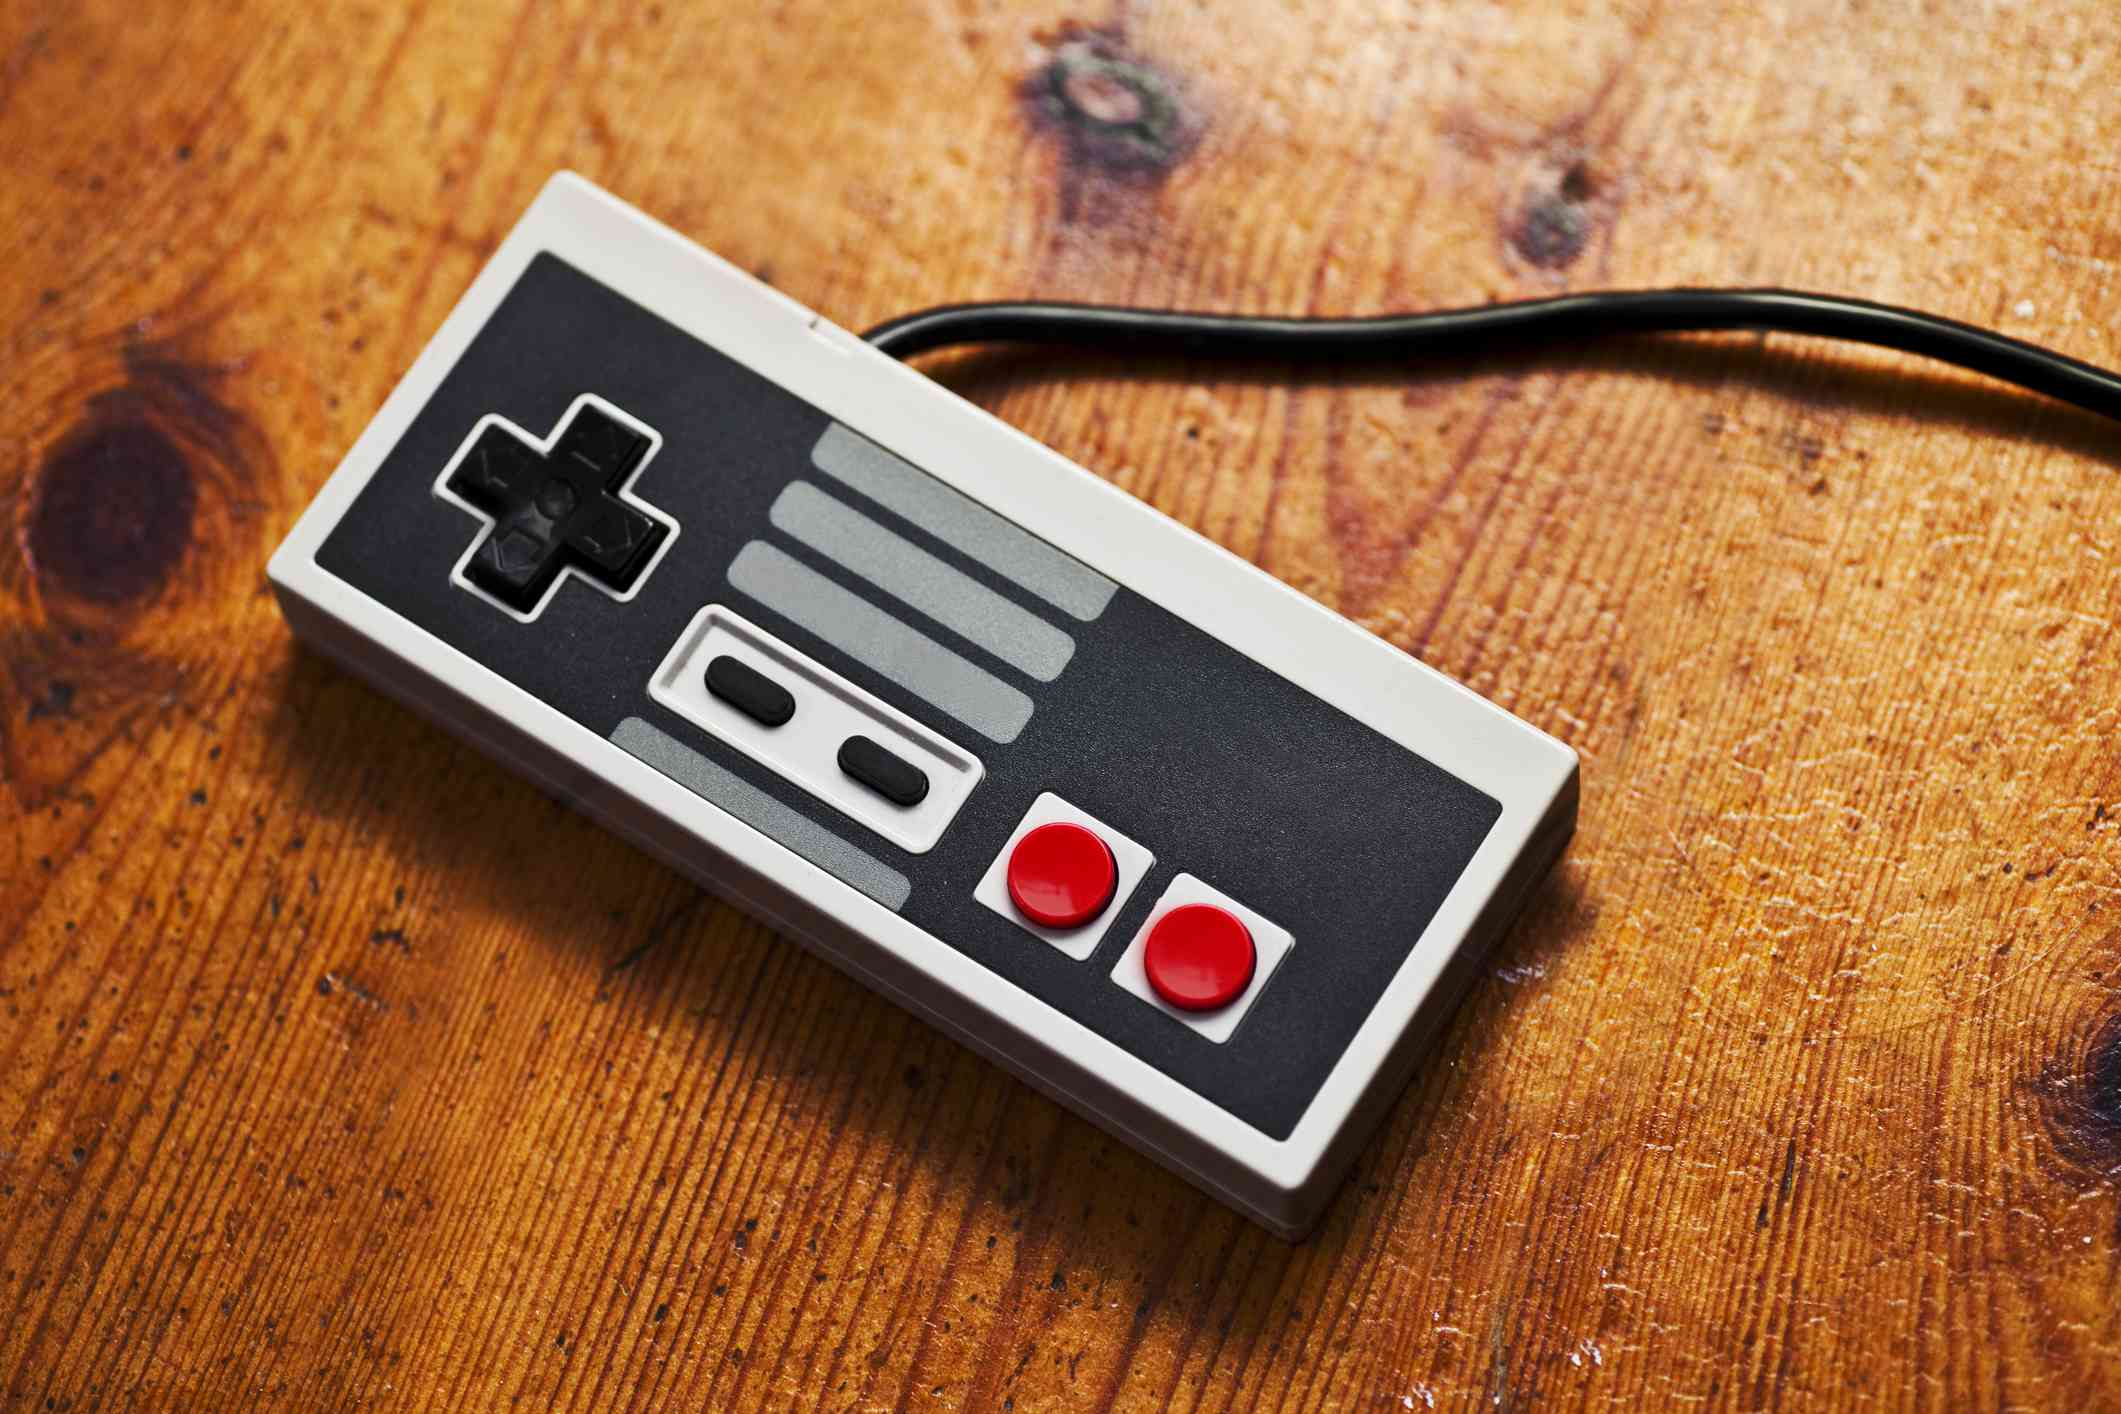 Retro gaming console controller.